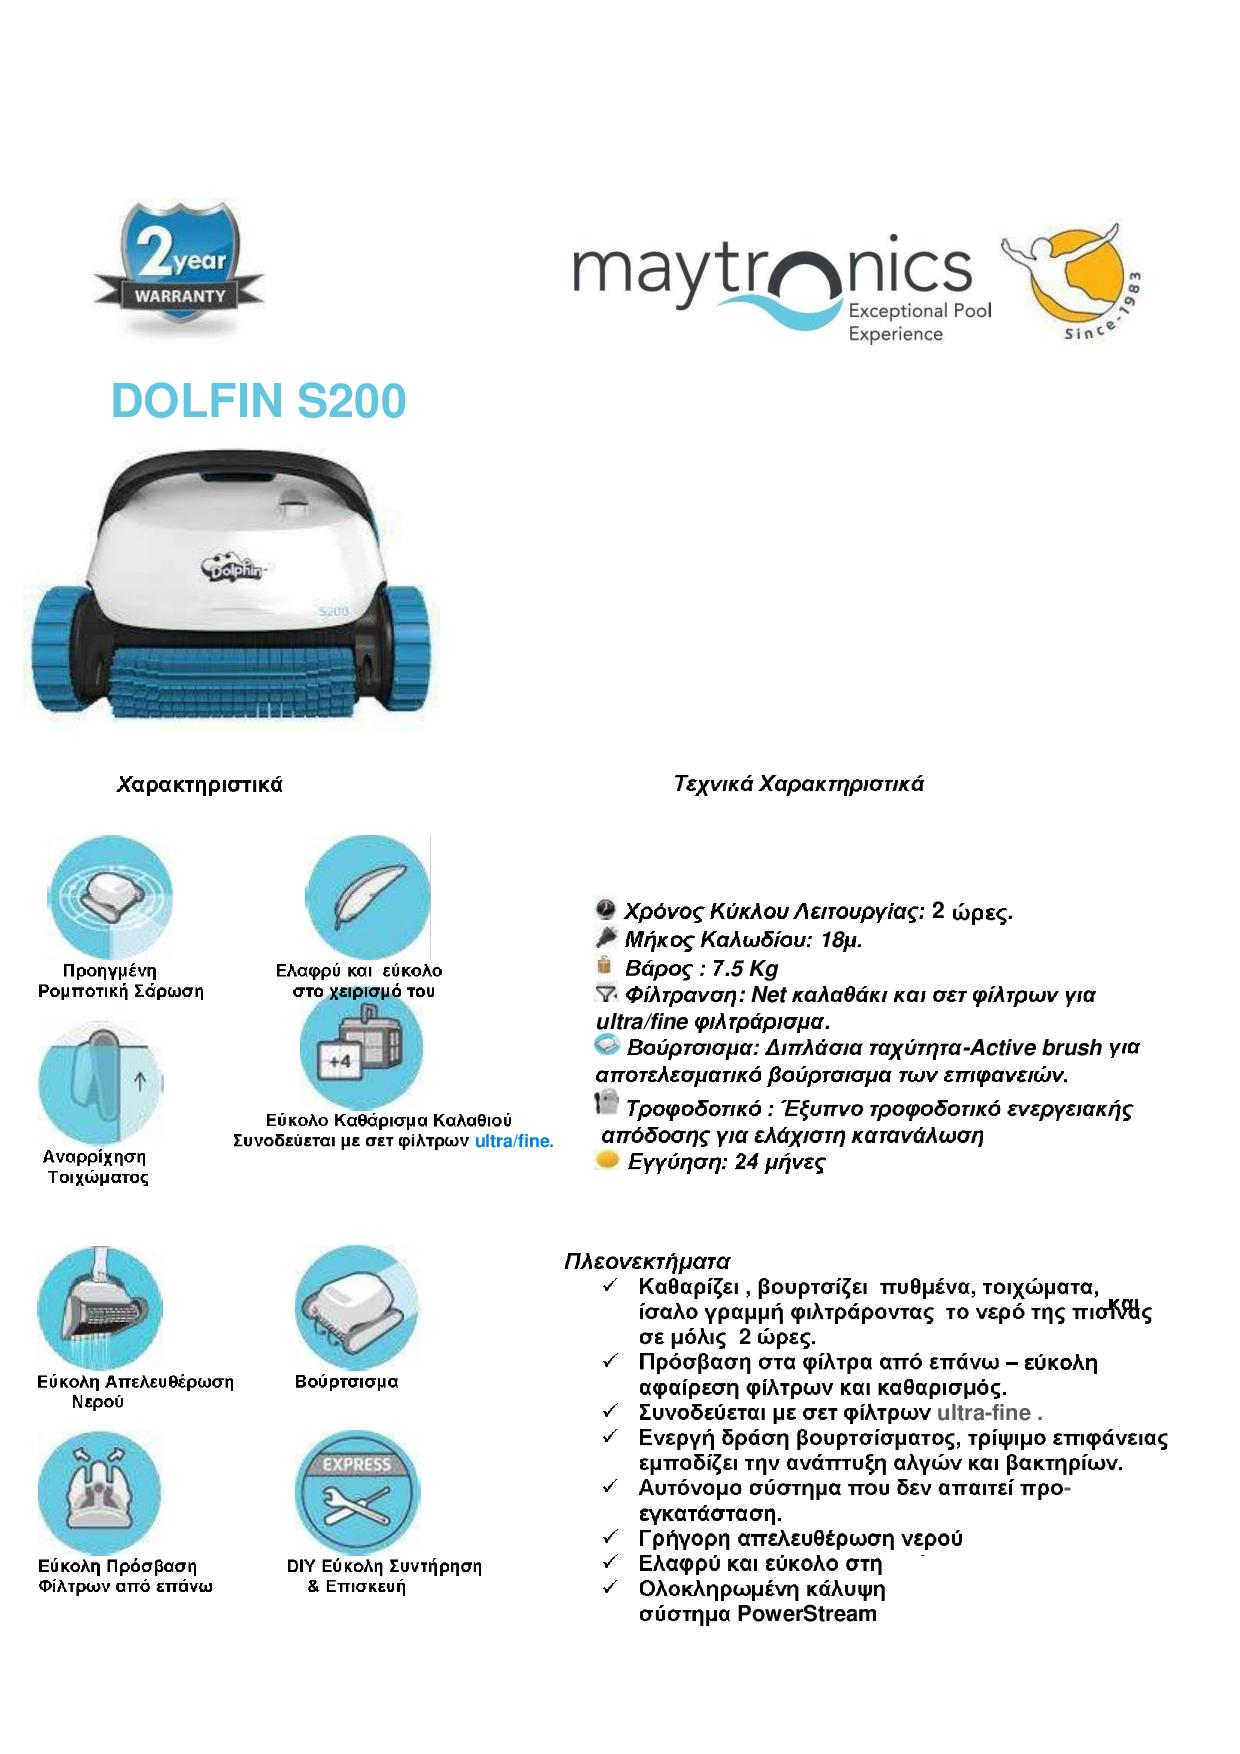 dolphin-s200